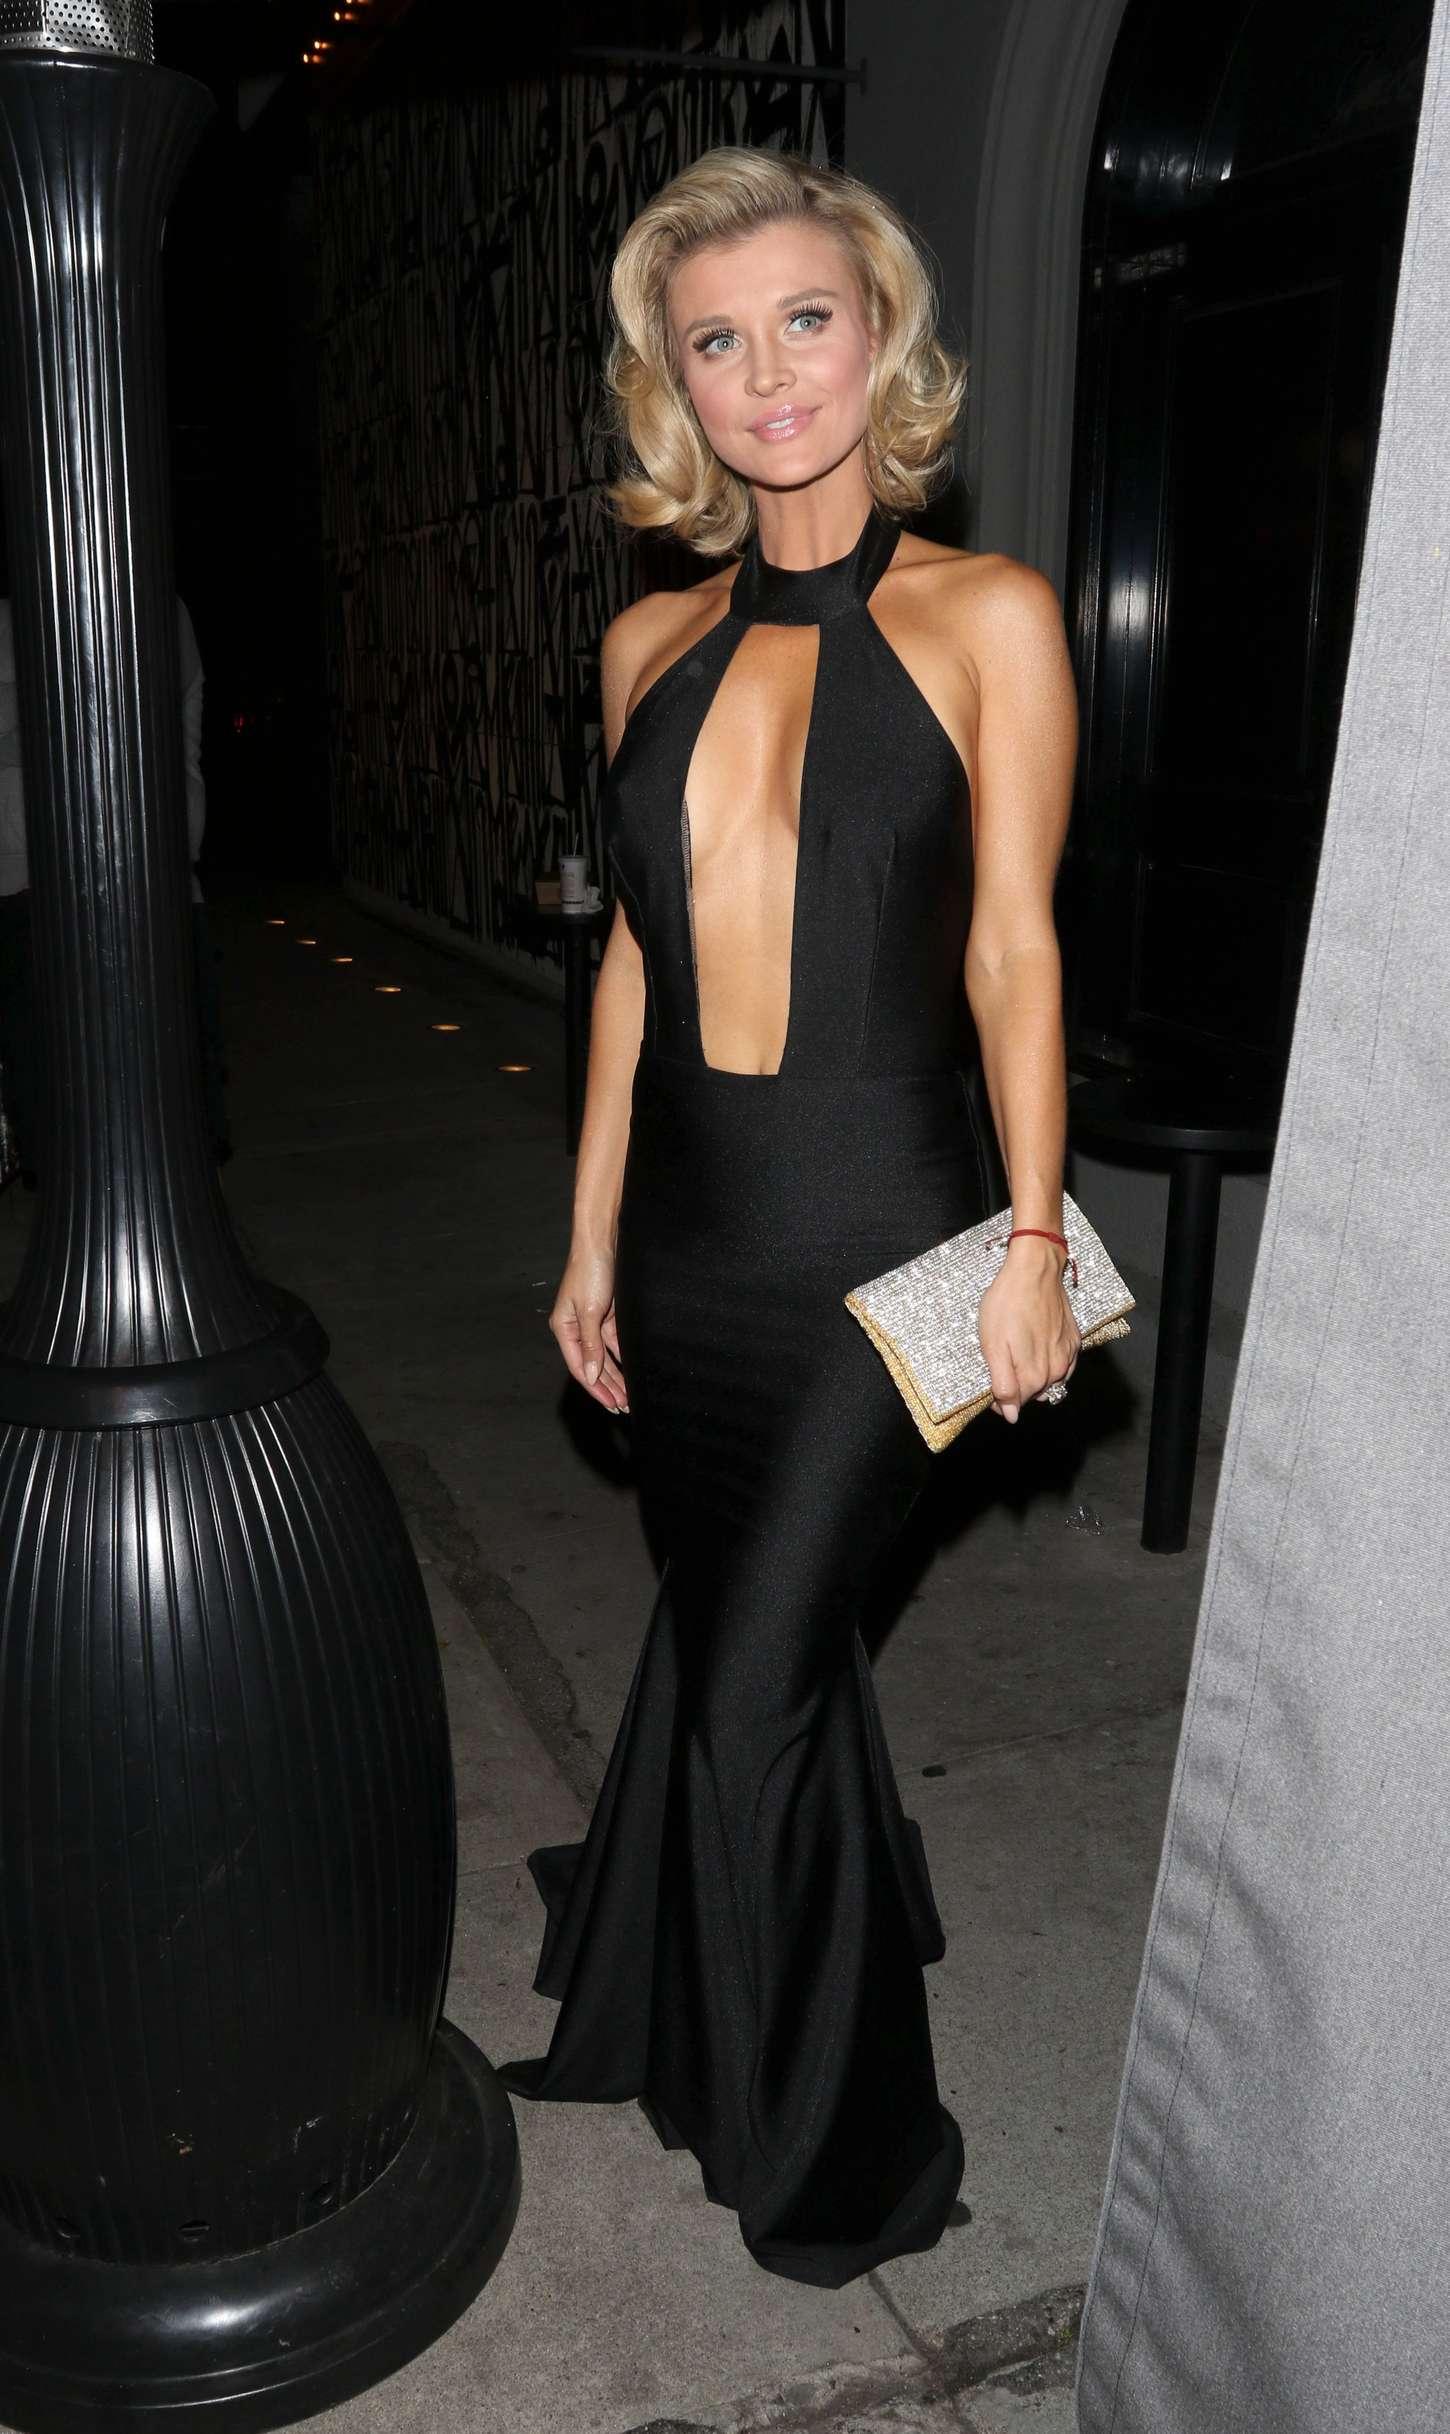 Joanna Krupa In Black Dress At Craigs 04 Gotceleb